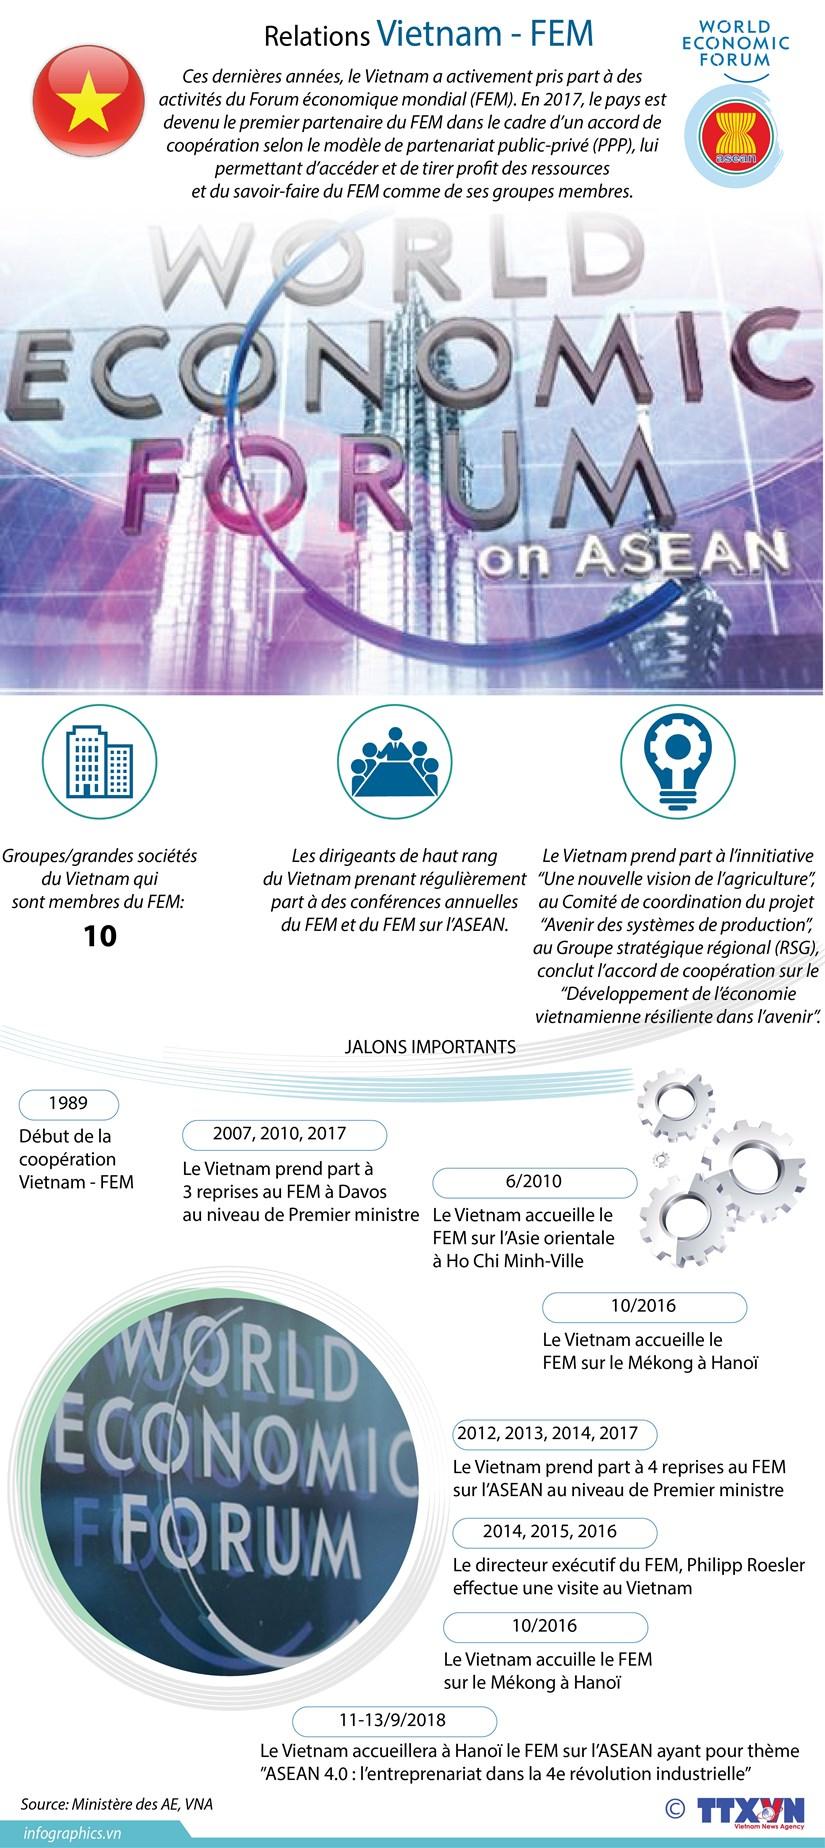 Les relations Vietnam - FEM en infographie hinh anh 1